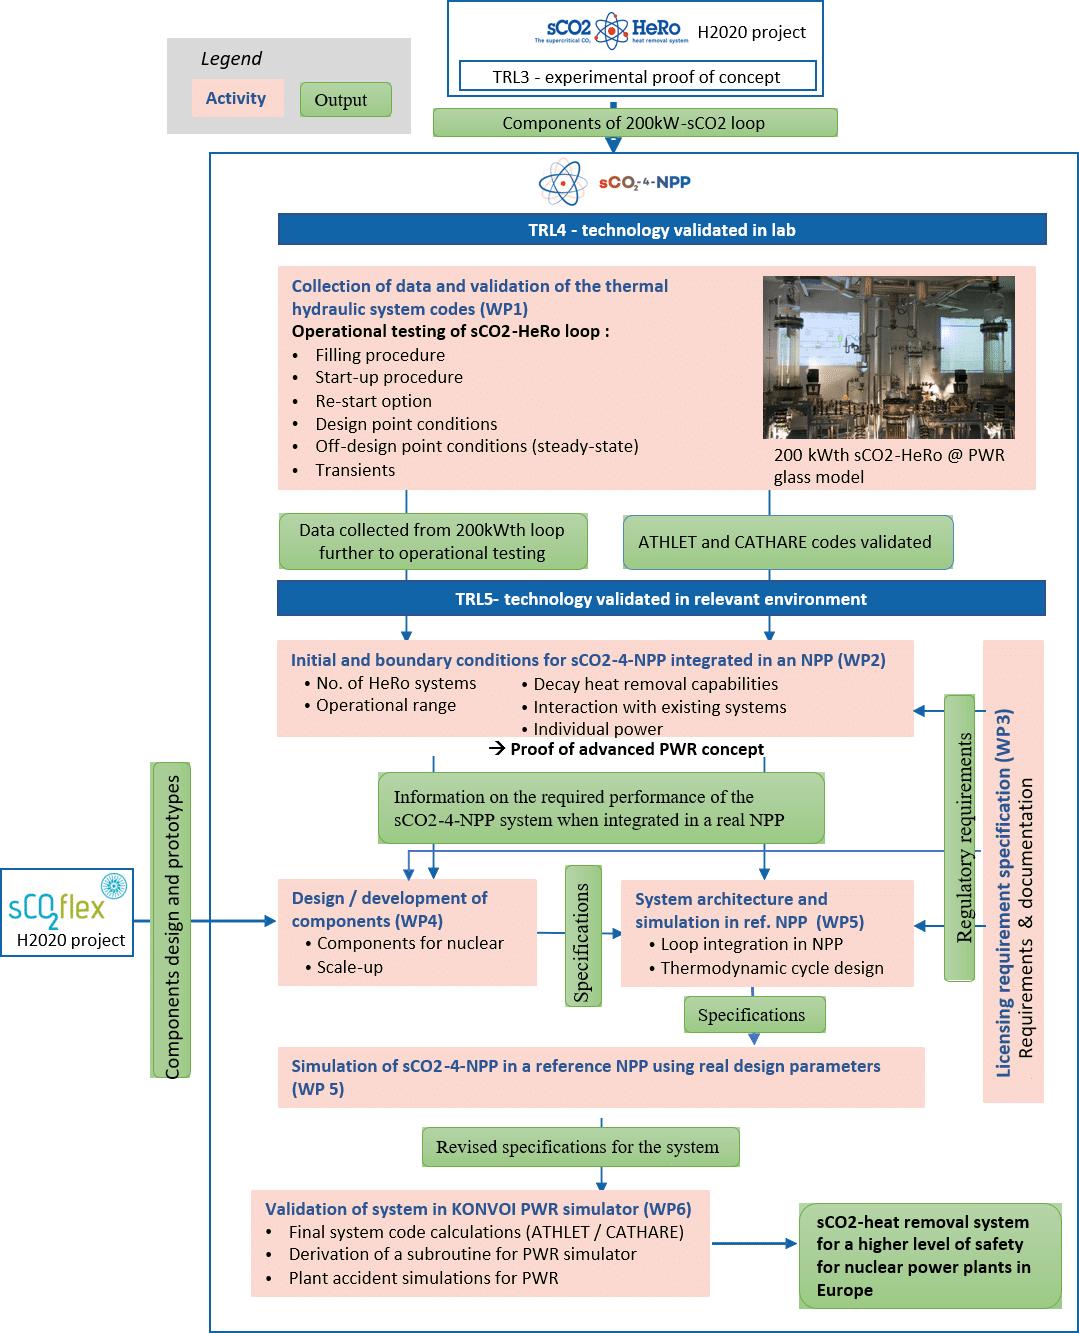 sCO2-4-NPP work-packages